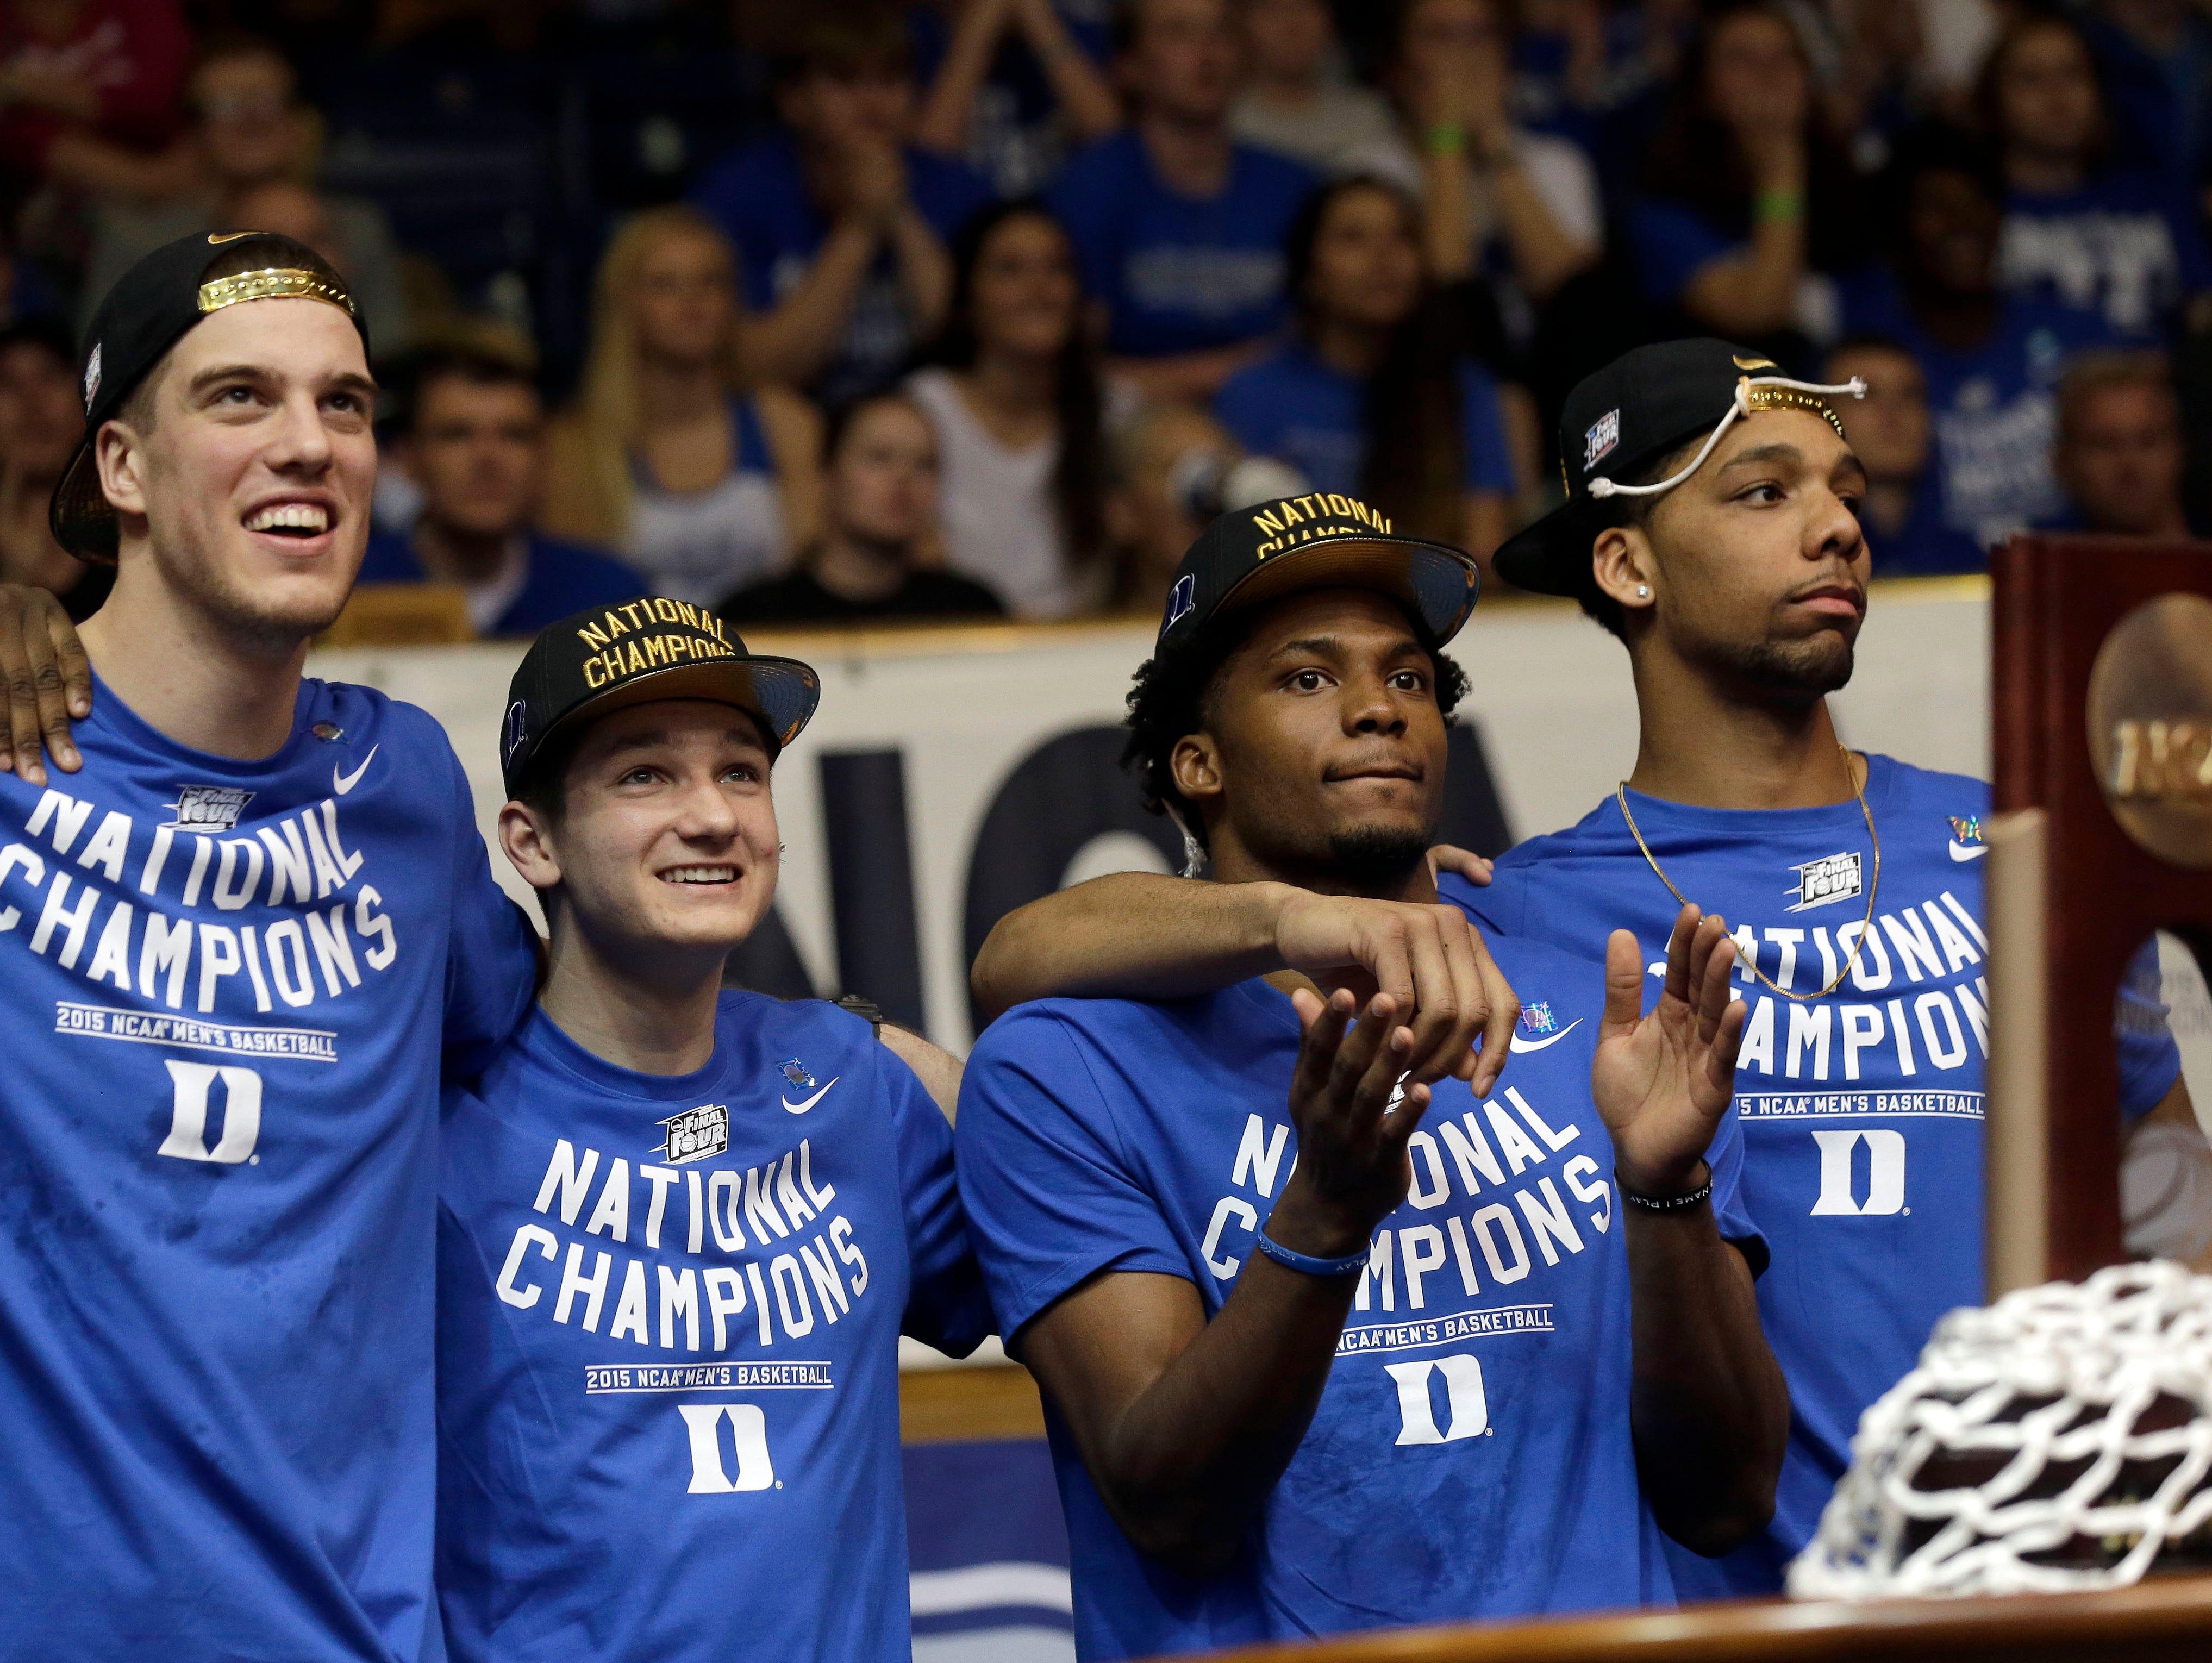 Marshall Plumlee, far left, is a junior basketball player at national champion Duke.